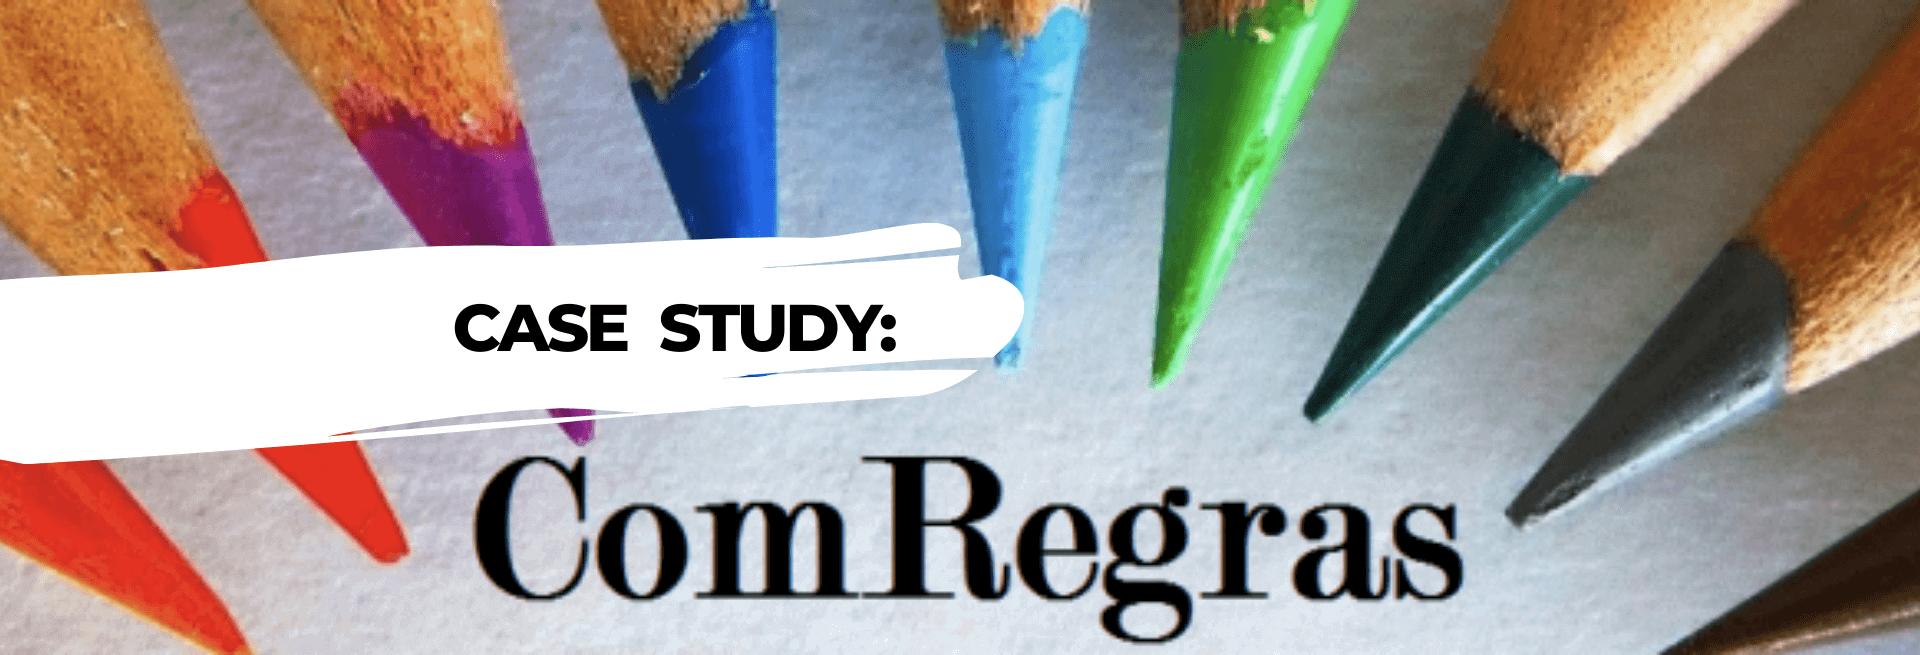 COMREGRAS CASE STUDY